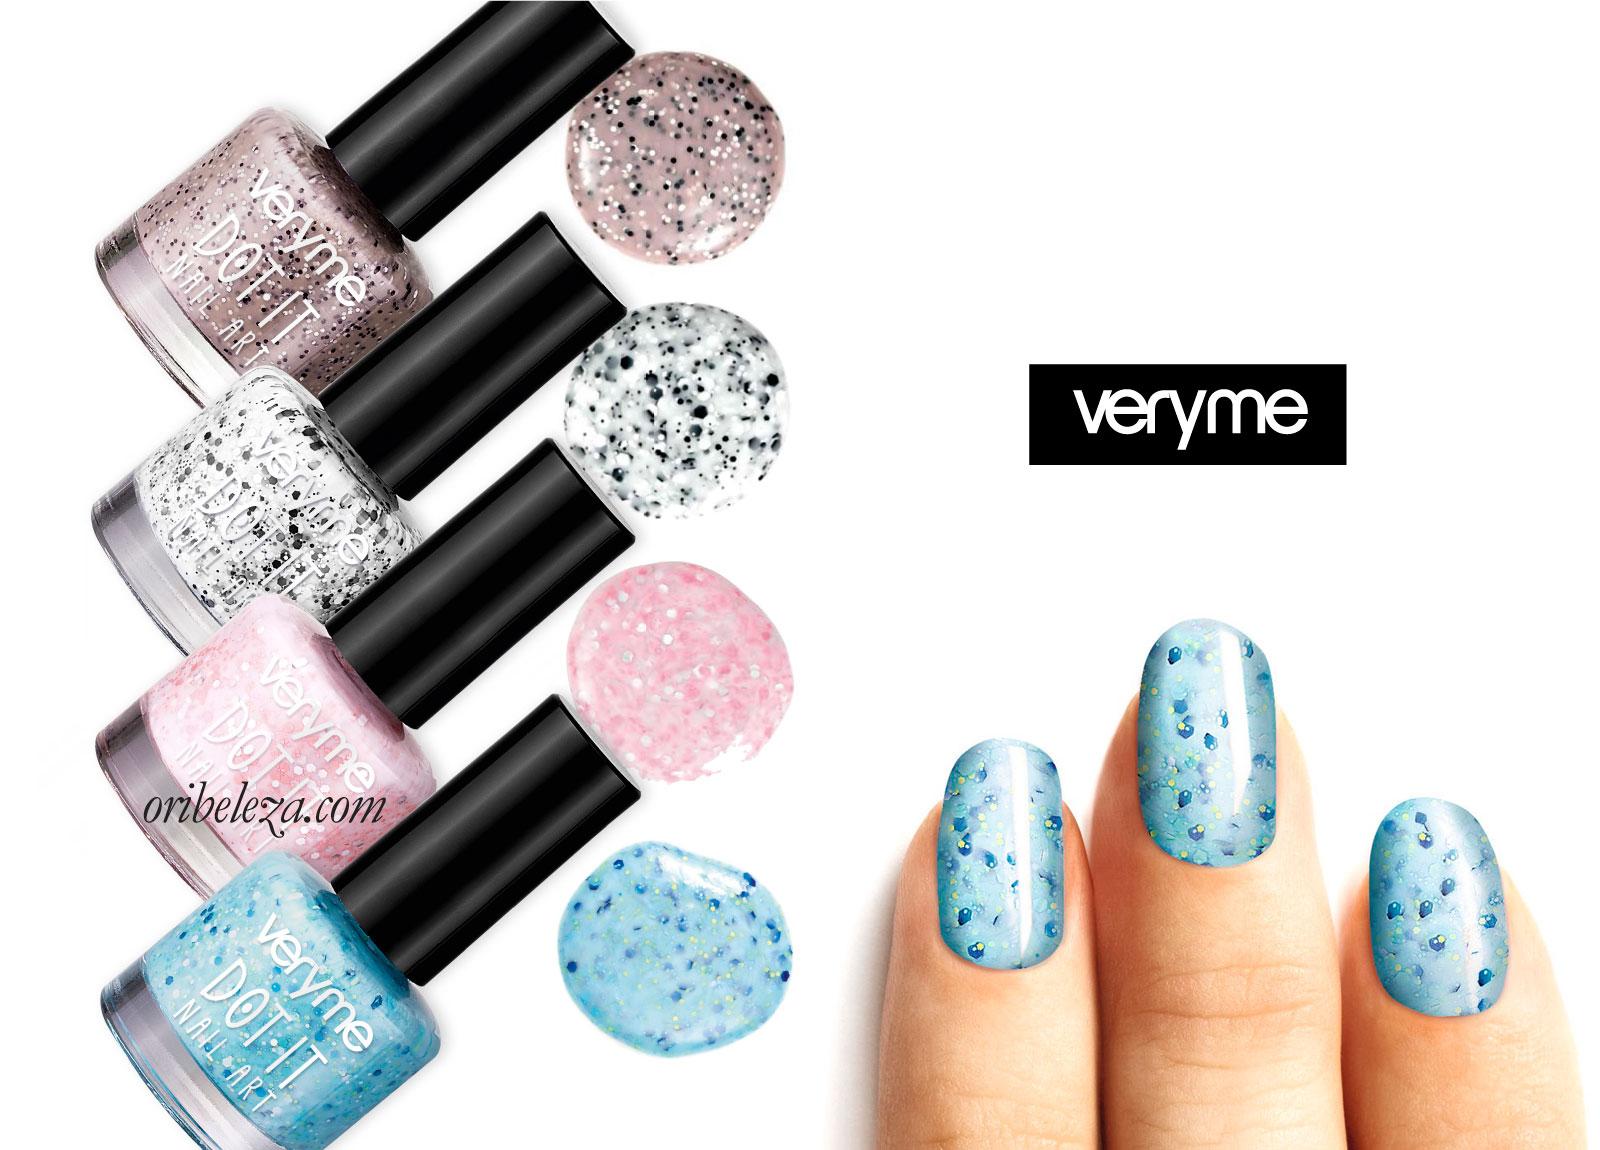 Verniz Dot-It Very Me da Oriflame